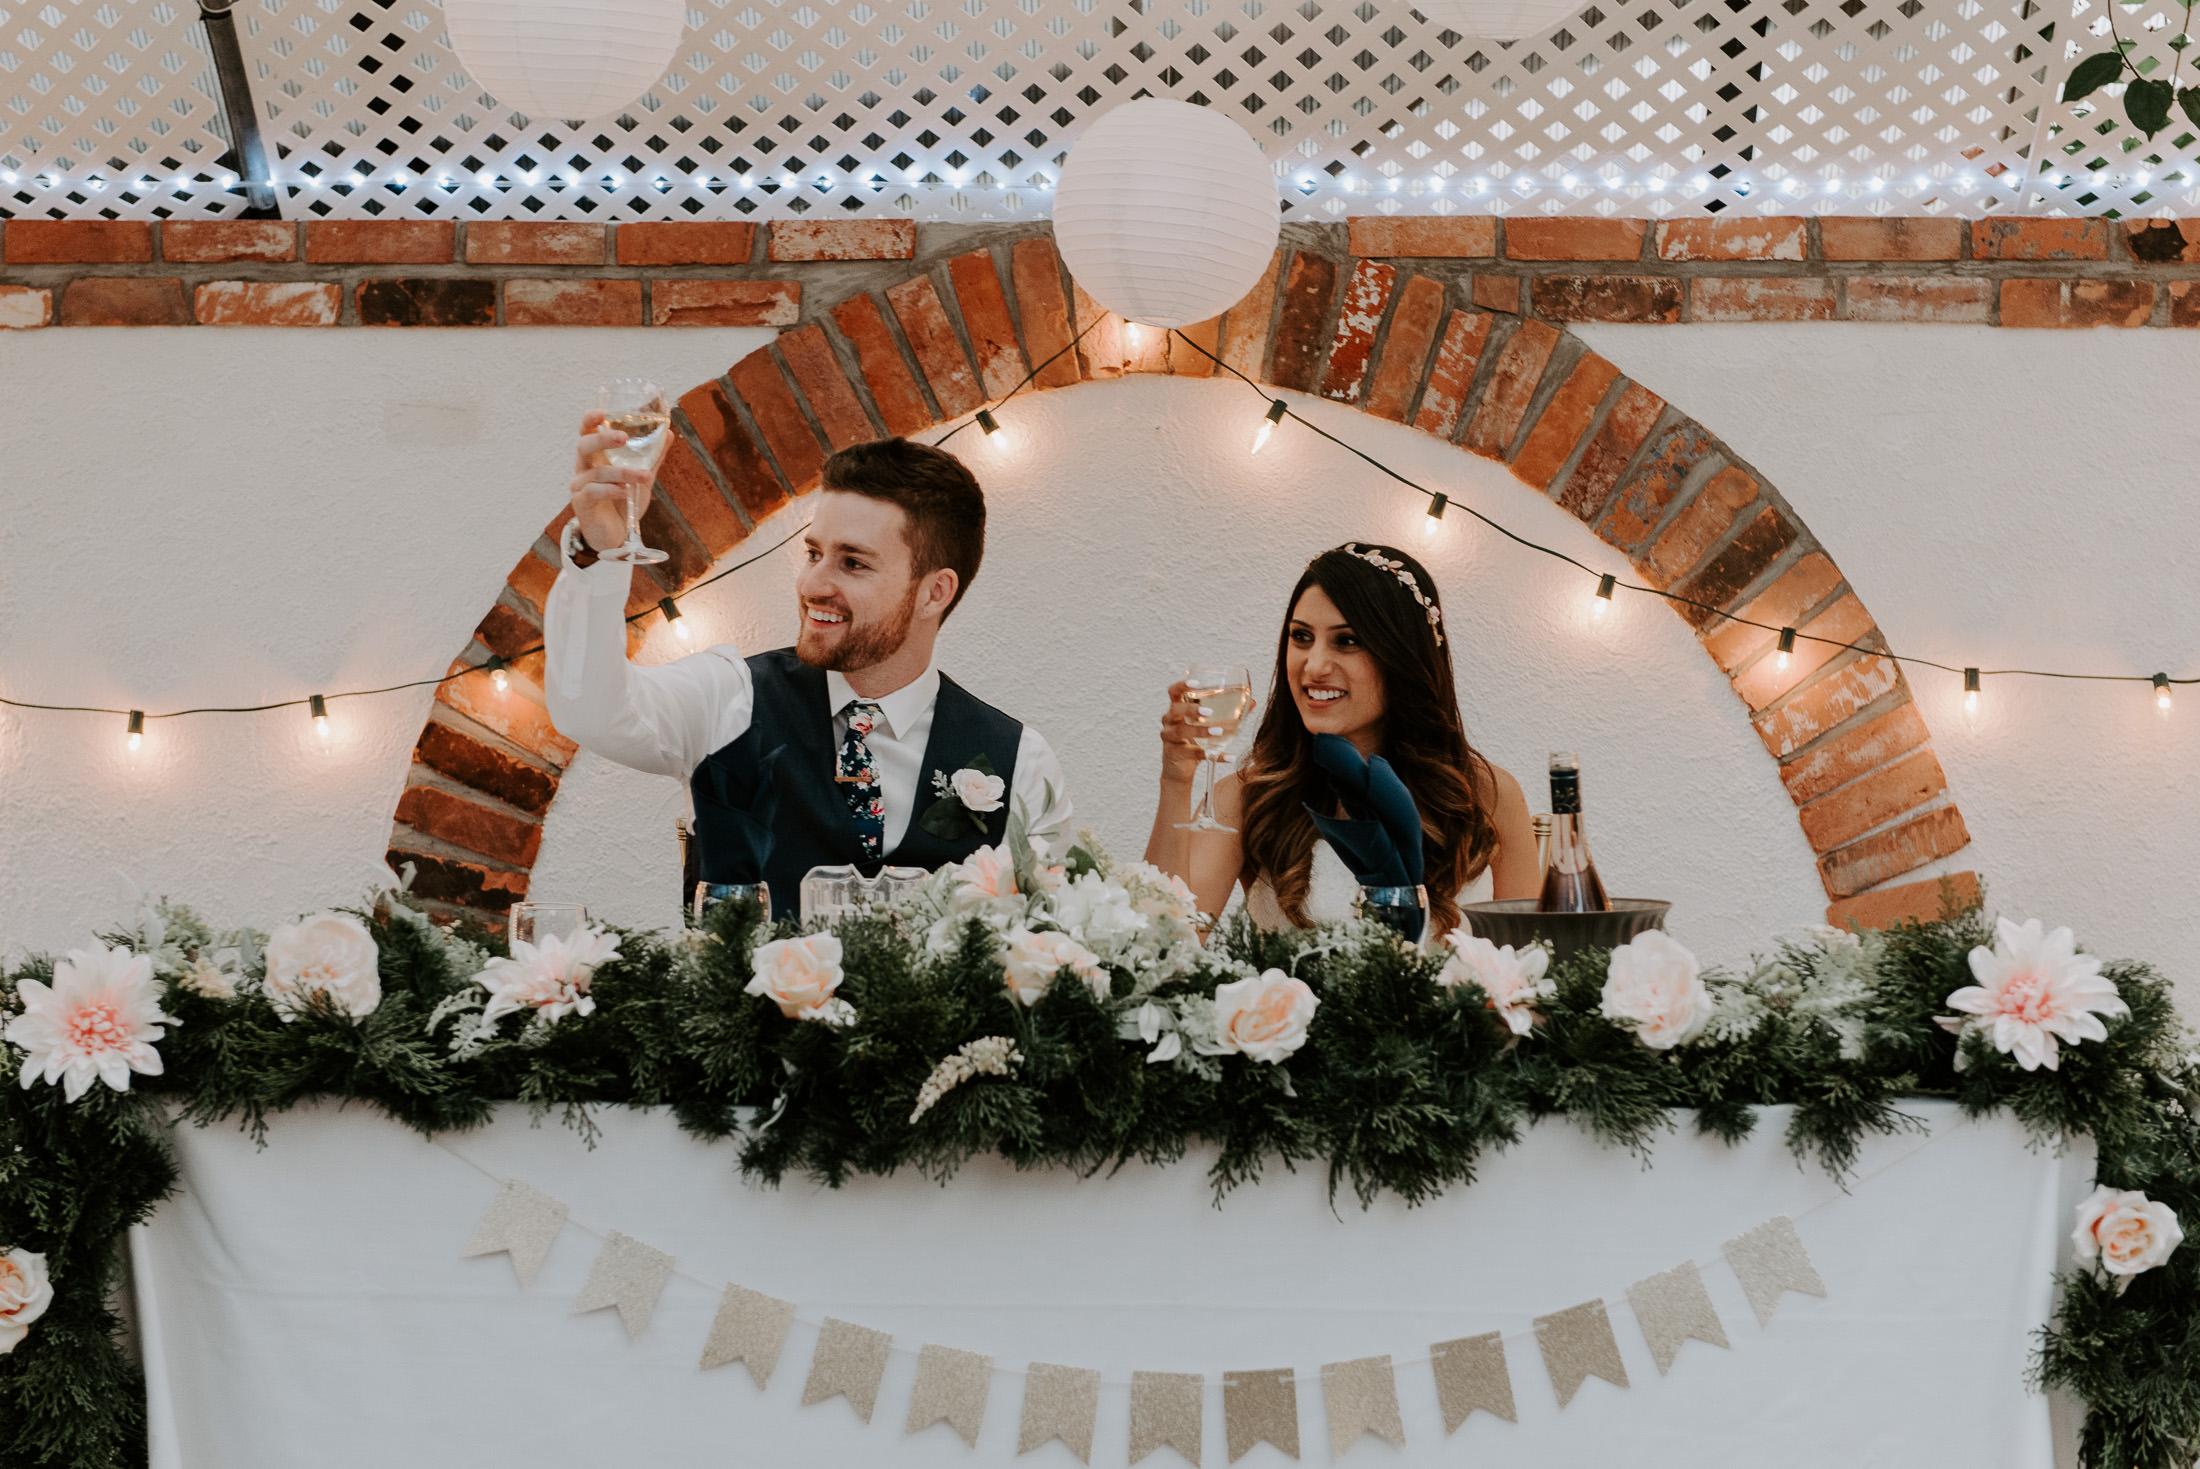 Couple's Table Wedding Day